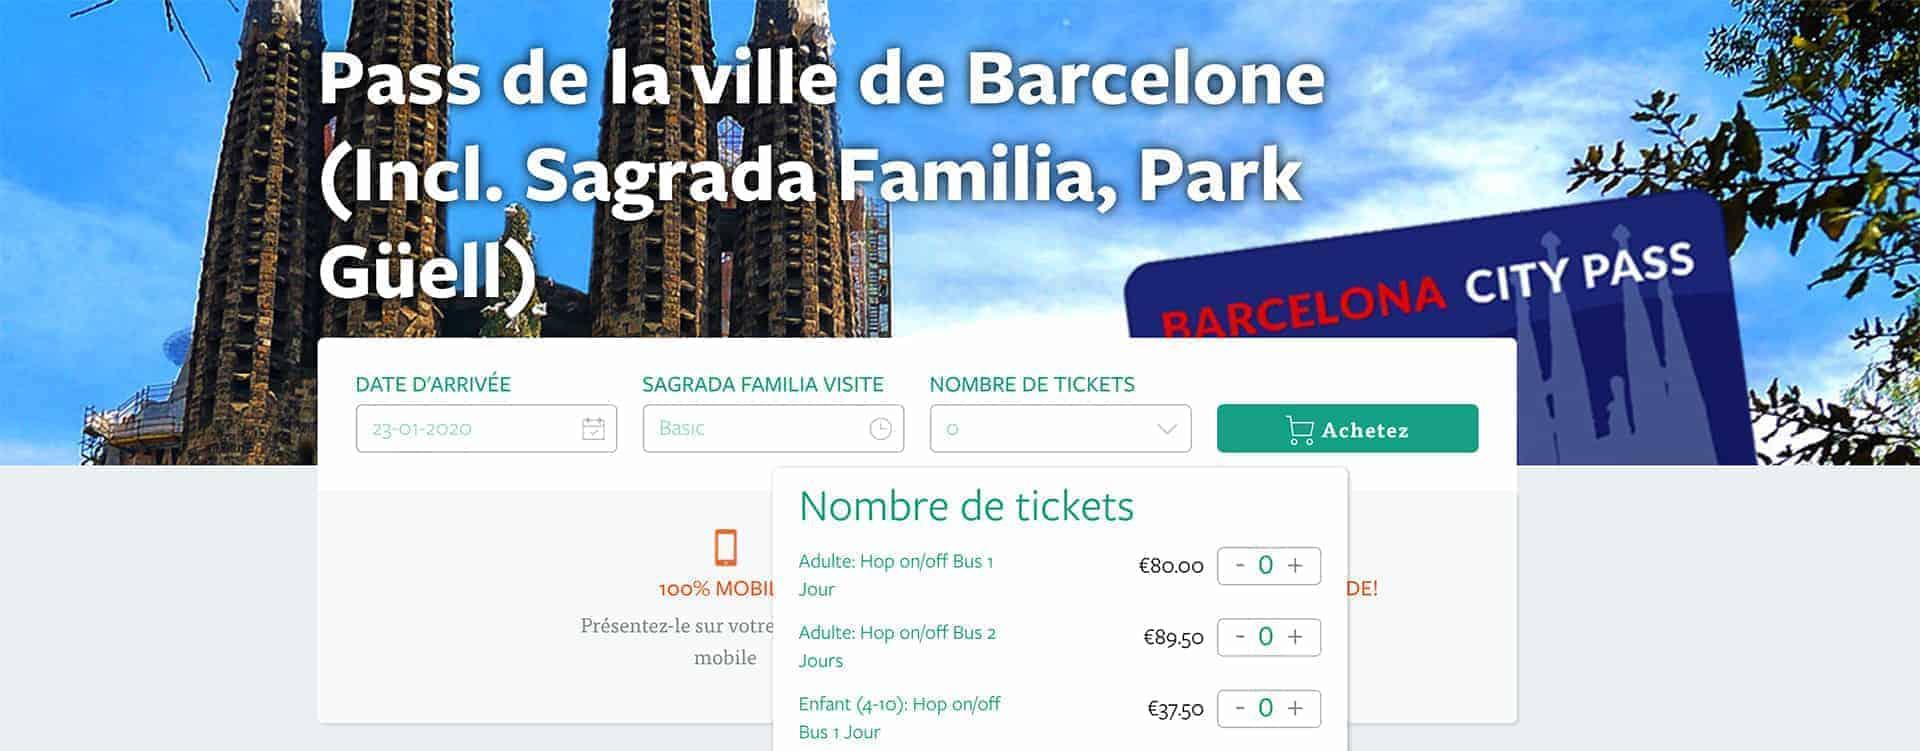 acheter barcelona city pass